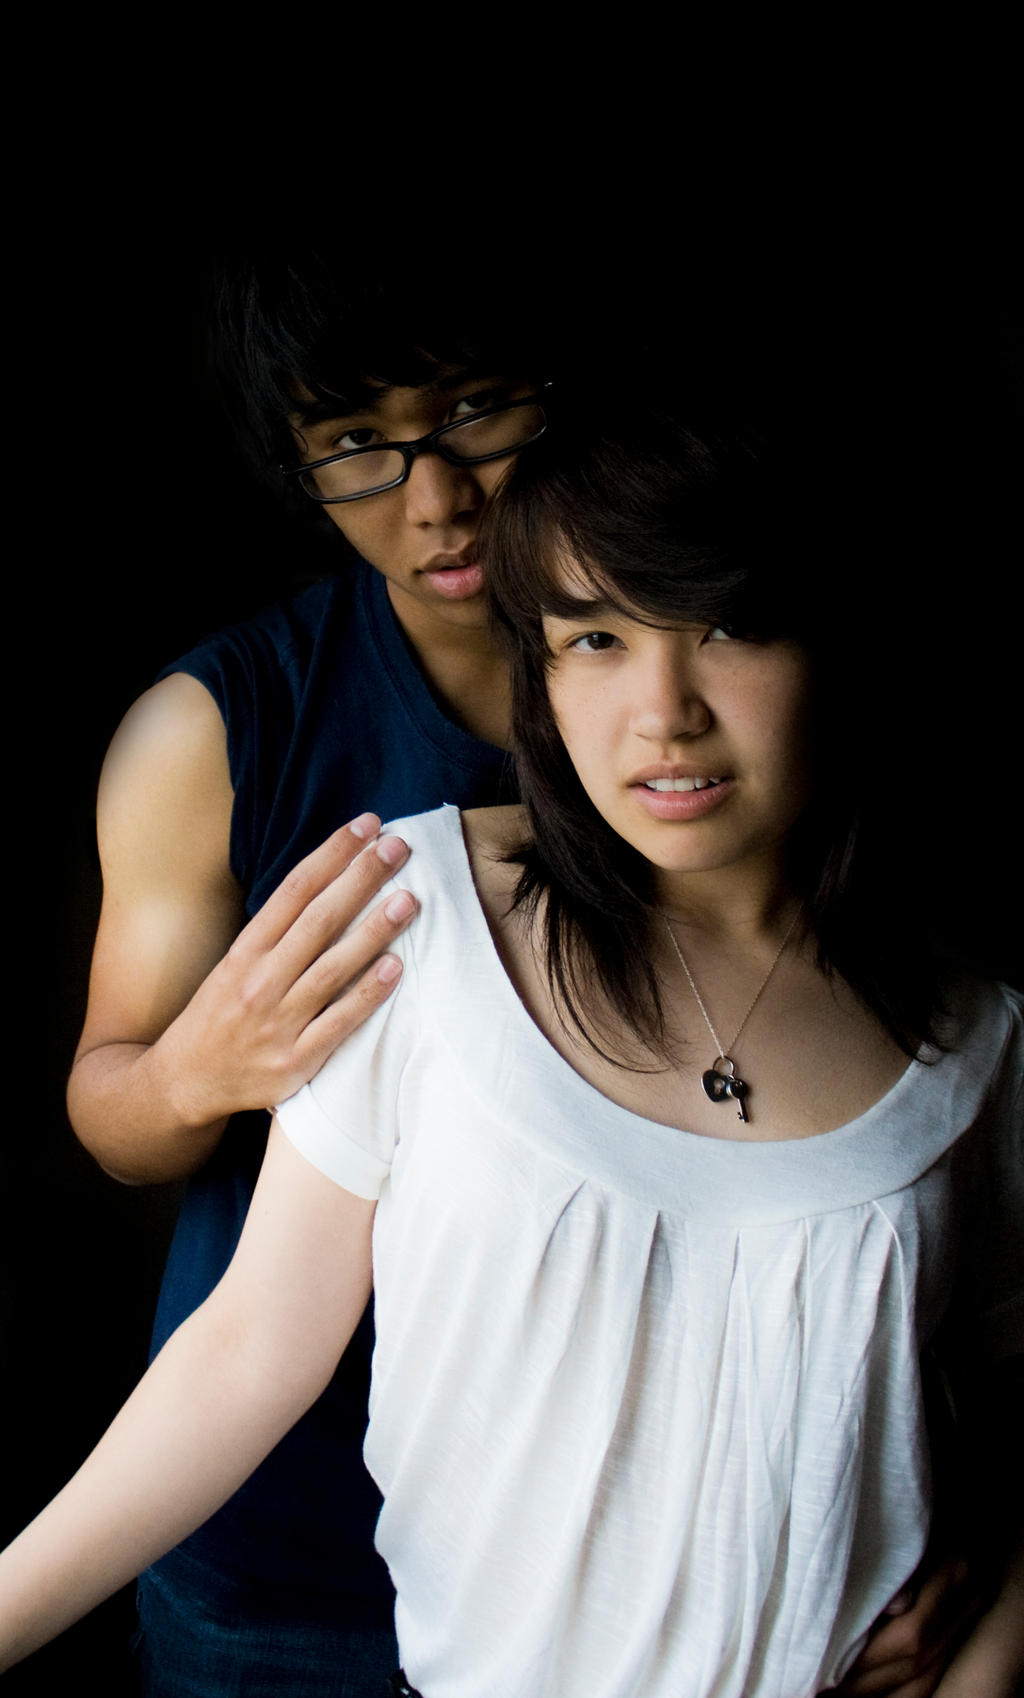 https://img00.deviantart.net/82da/i/2009/120/4/9/asian_love_by_birdy95464.jpg